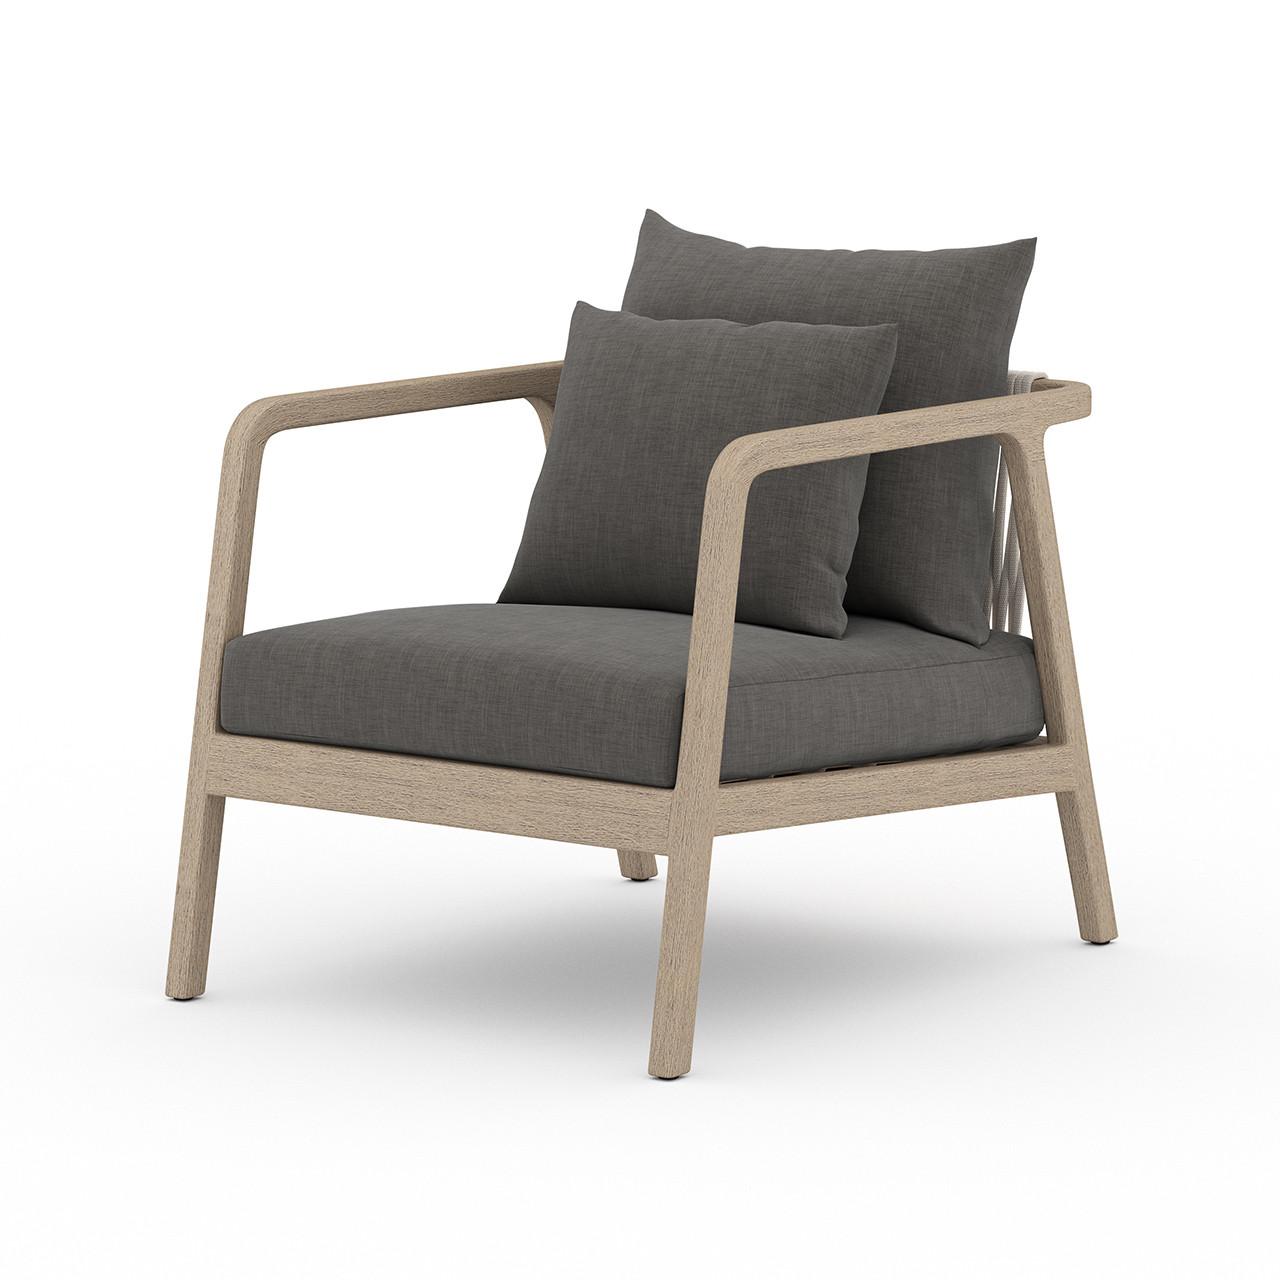 La Palma Teak Outdoor Lounge Chair - Washed Brown